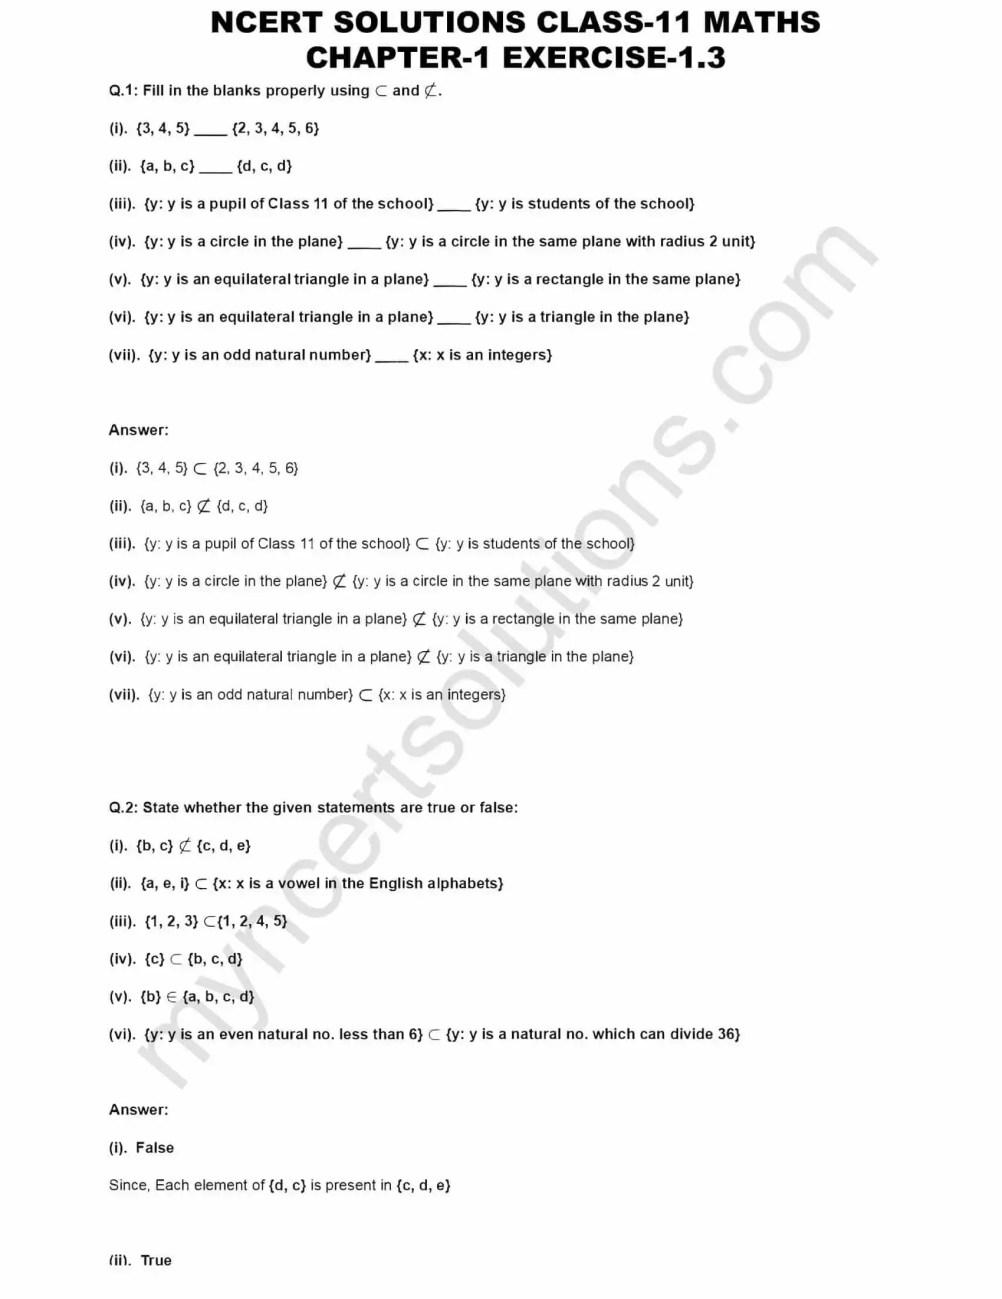 NCERT Solutions For Class 11 Maths Chapter 1 Ex 1 3